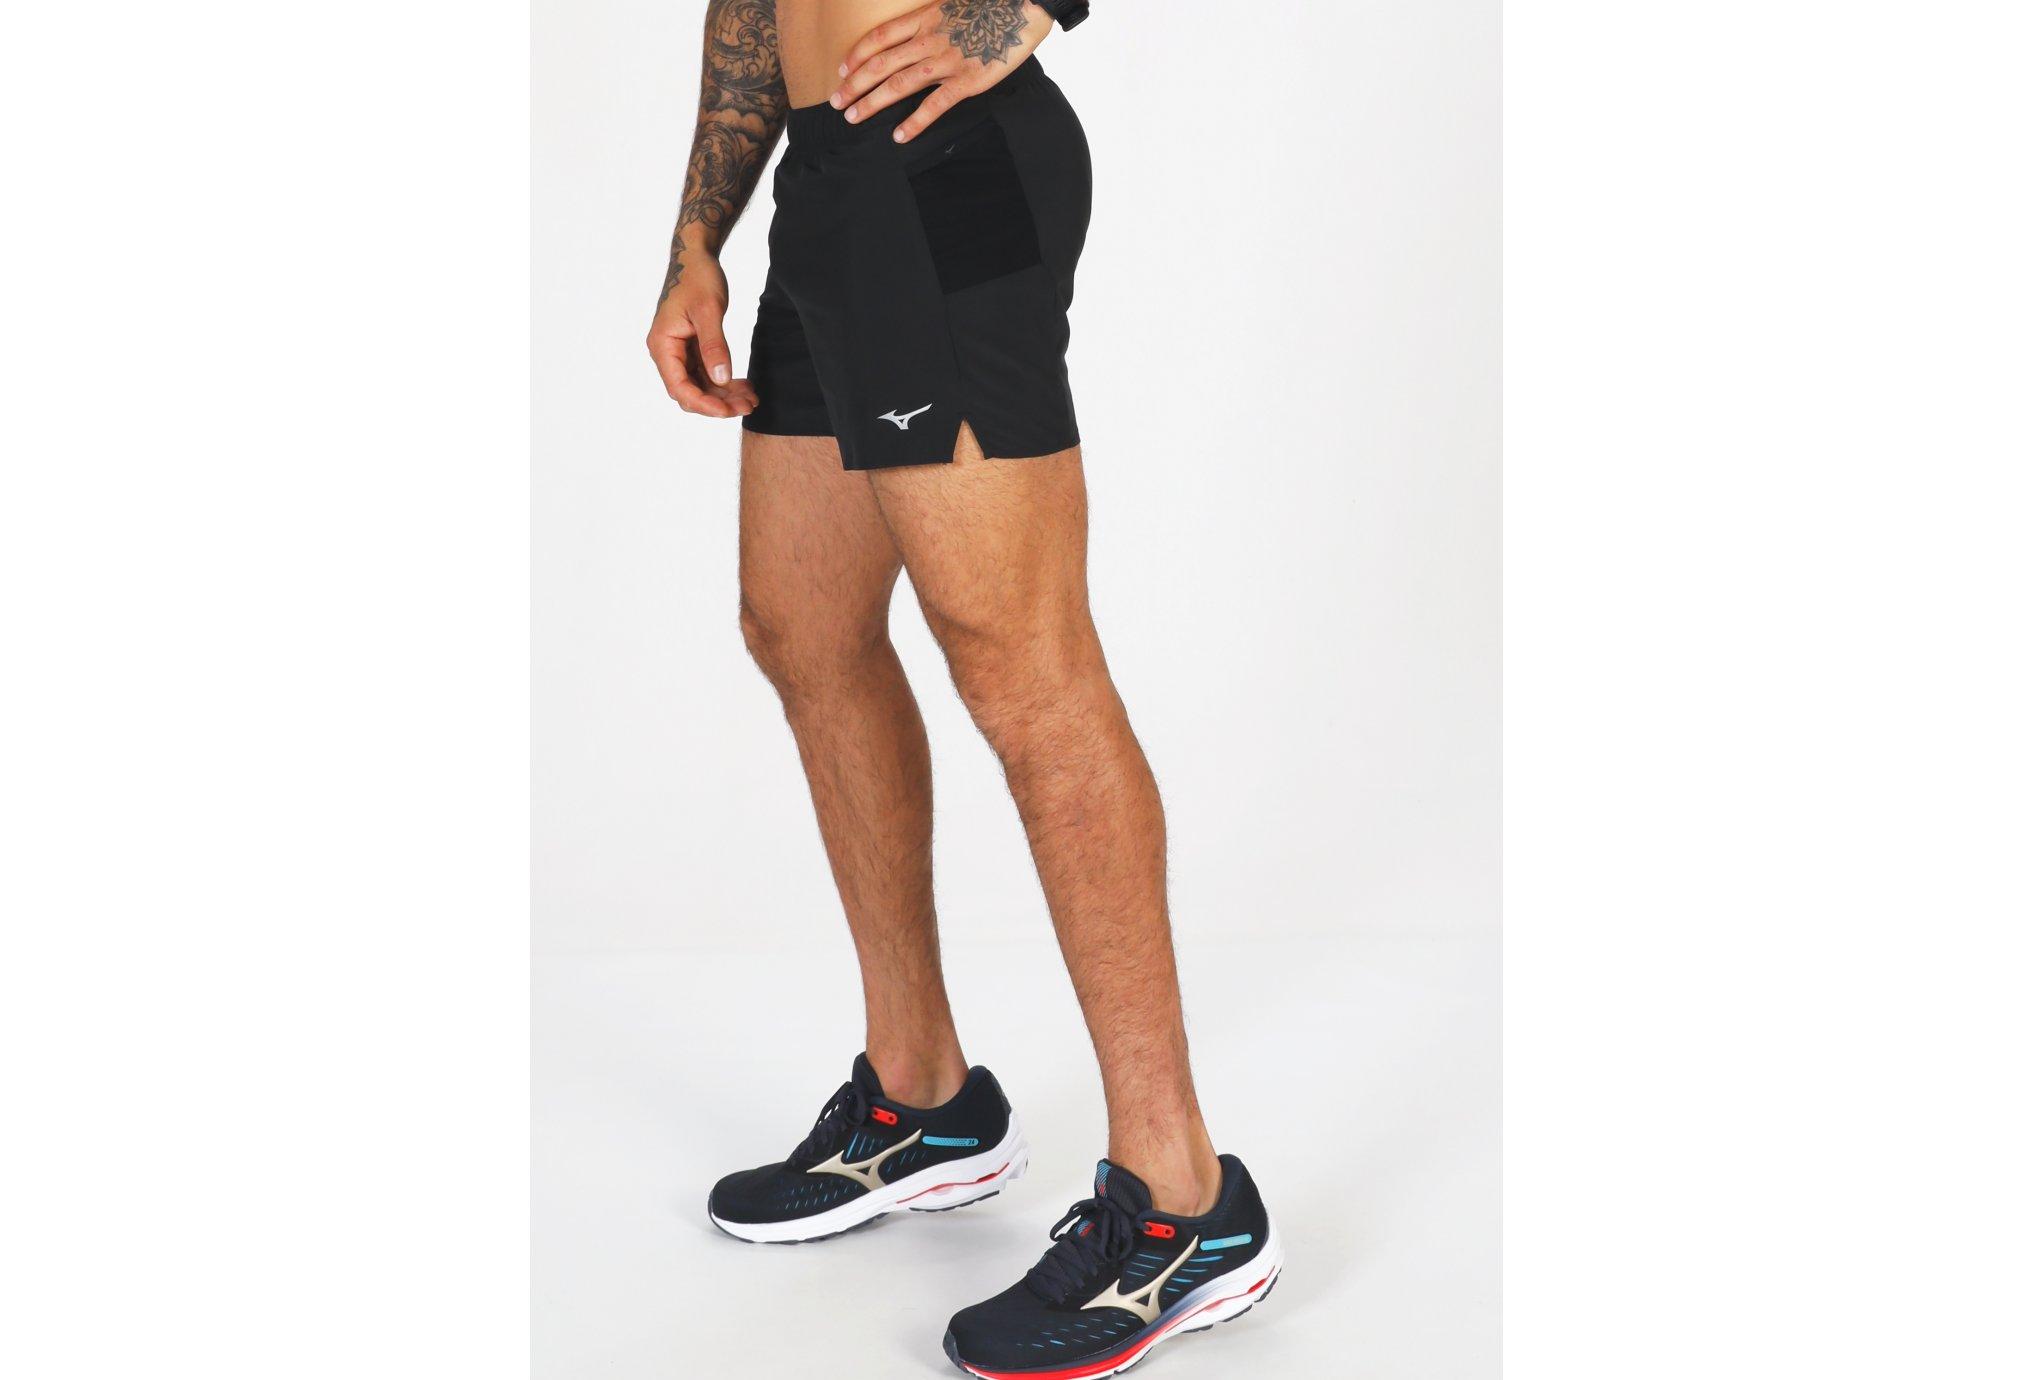 Mizuno Alpha 5.5 M vêtement running homme